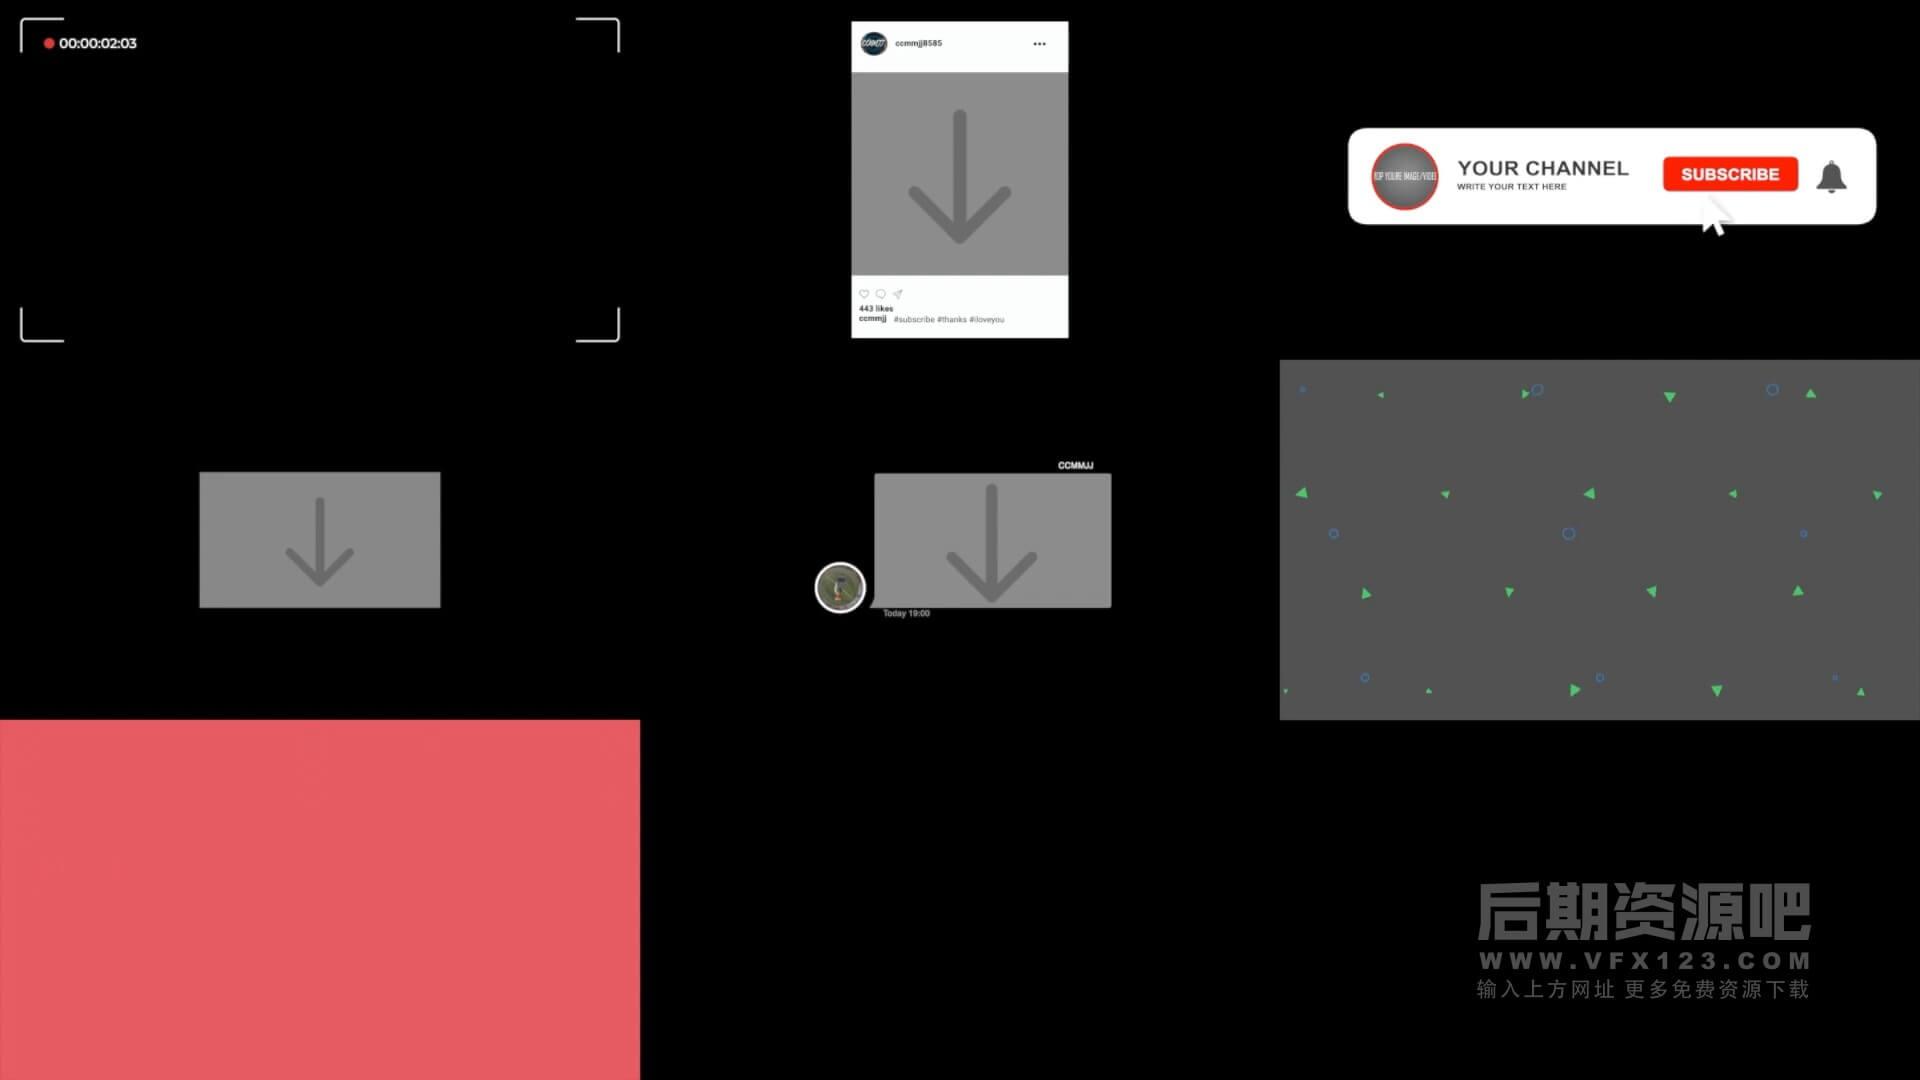 fcpx插件 倒计时计数器简约标题取景框等Vlog制作常用素材包